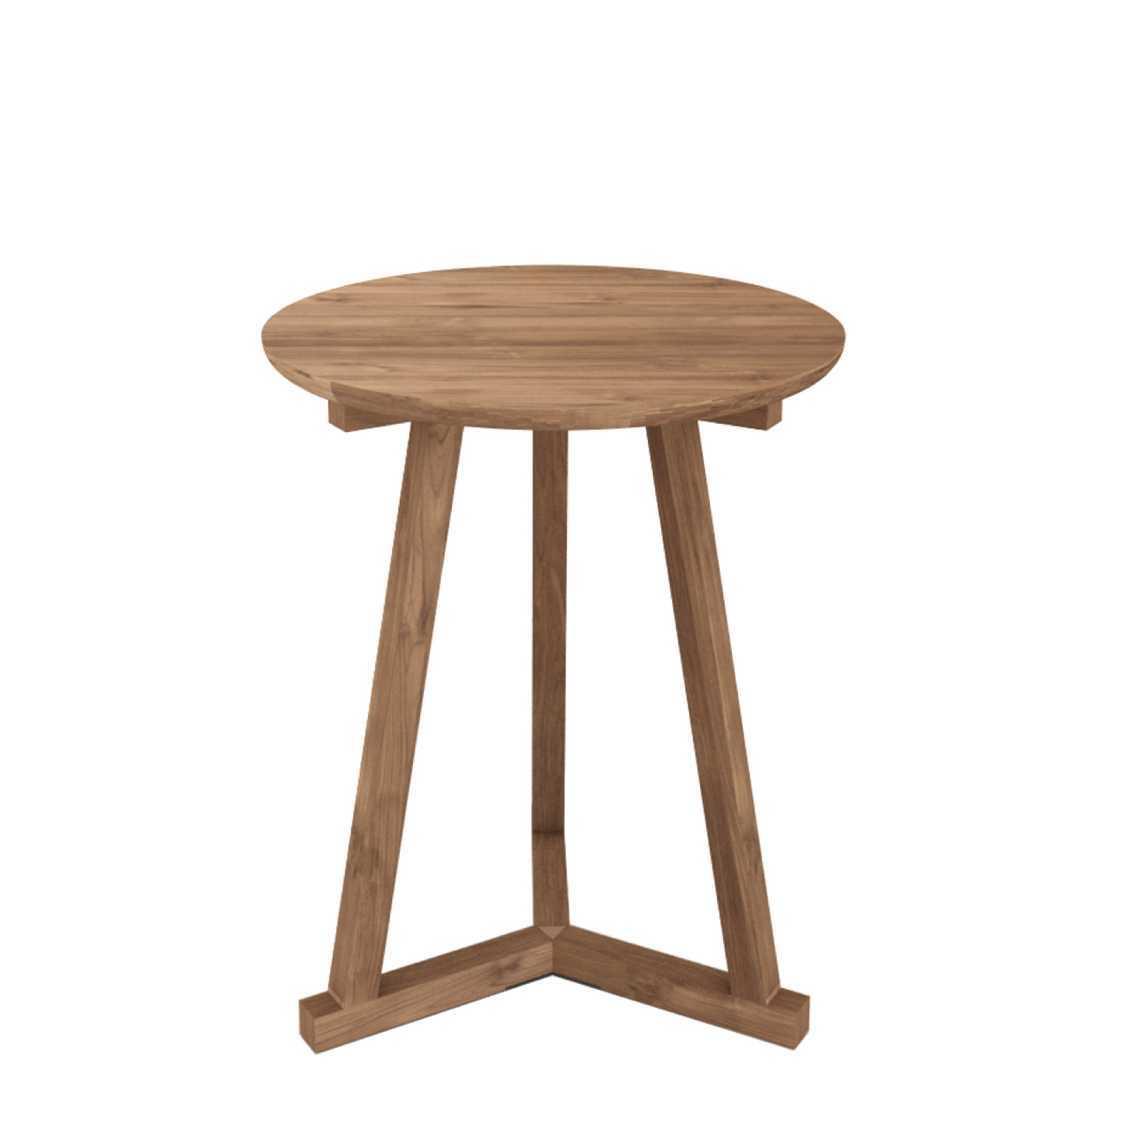 Ethnicraft Tripod teak tafel-ø 46 cm